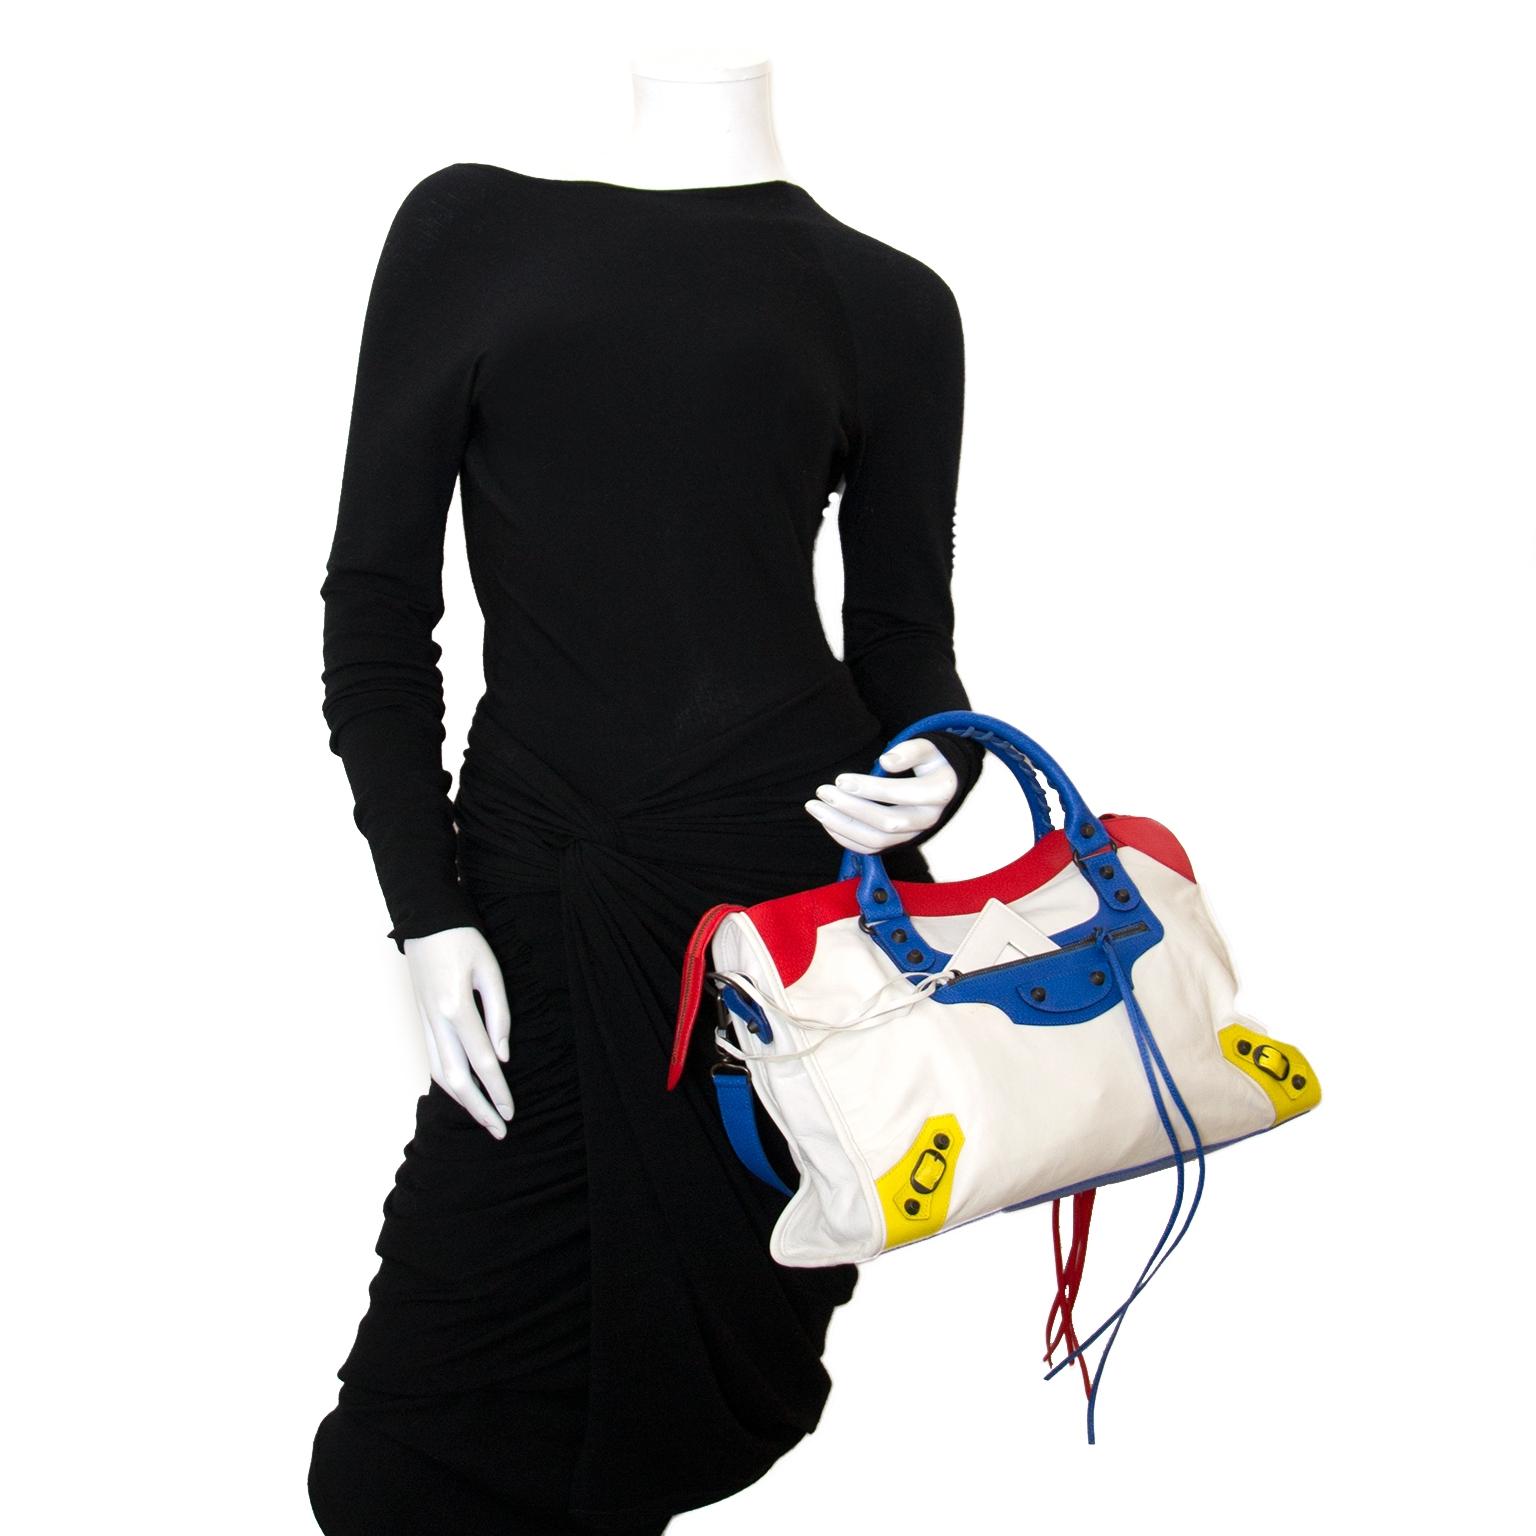 Koop authentieke balenciaga city tassen bij Labellov vintage mode webshop belgië